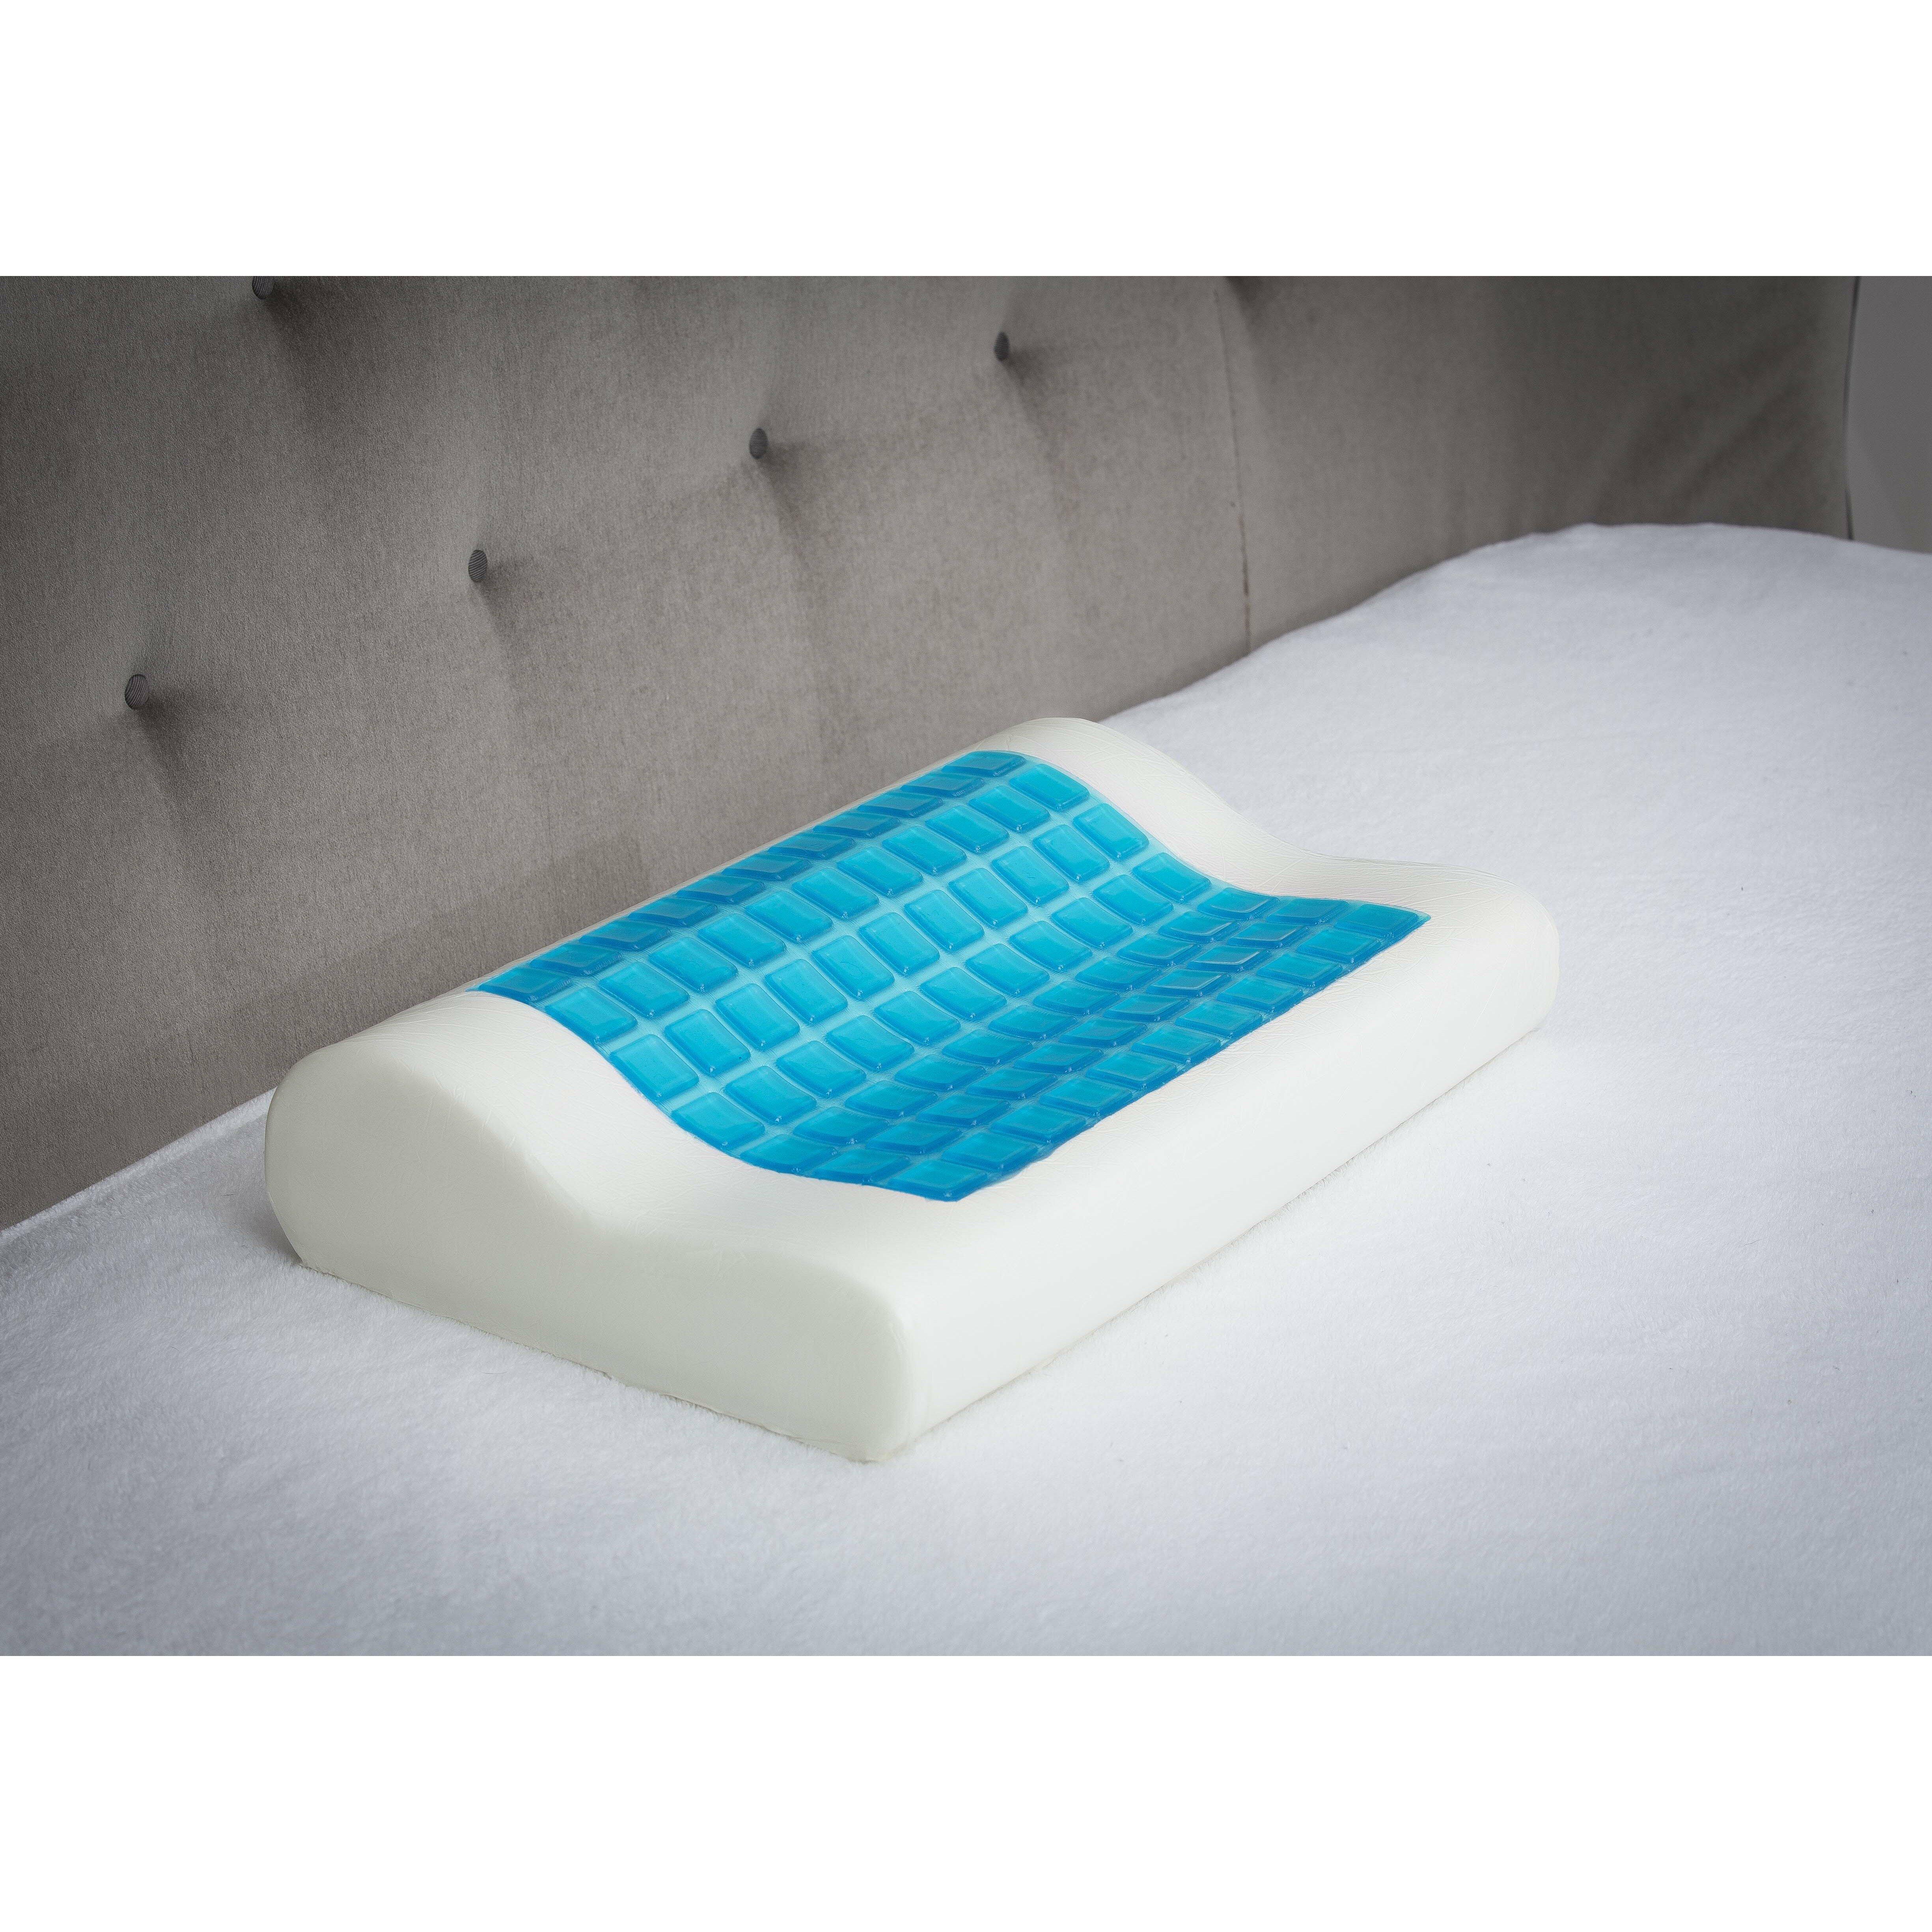 Modern Home Memory Foam Gel Pillow : Ergonomic Memory Foam Gel Pillow Wayfair